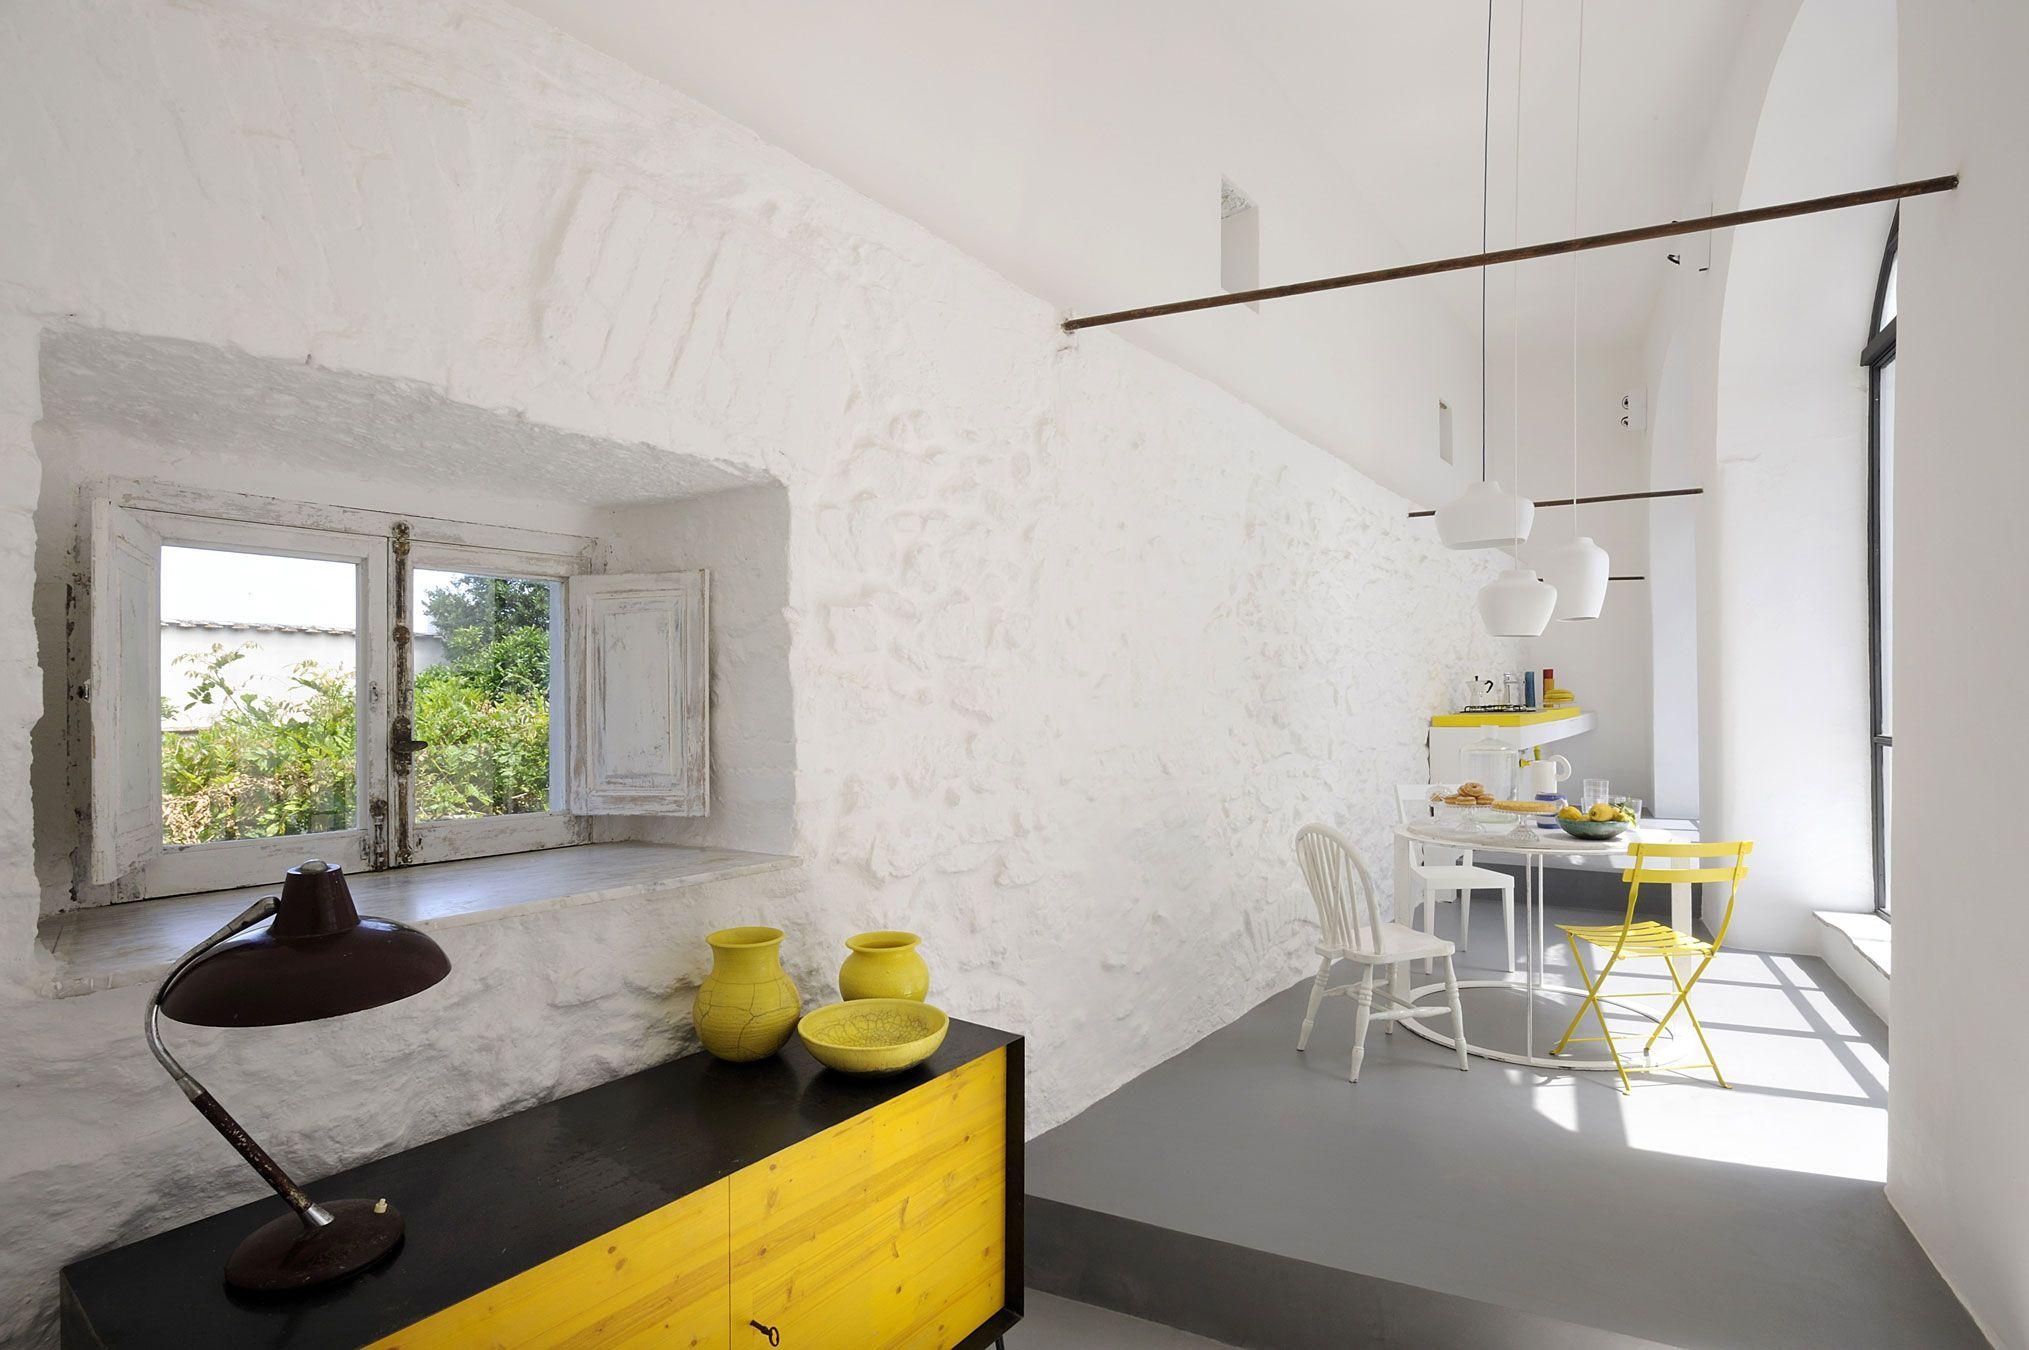 Capri Suite / Zetastudio | Hospitality | Pinterest